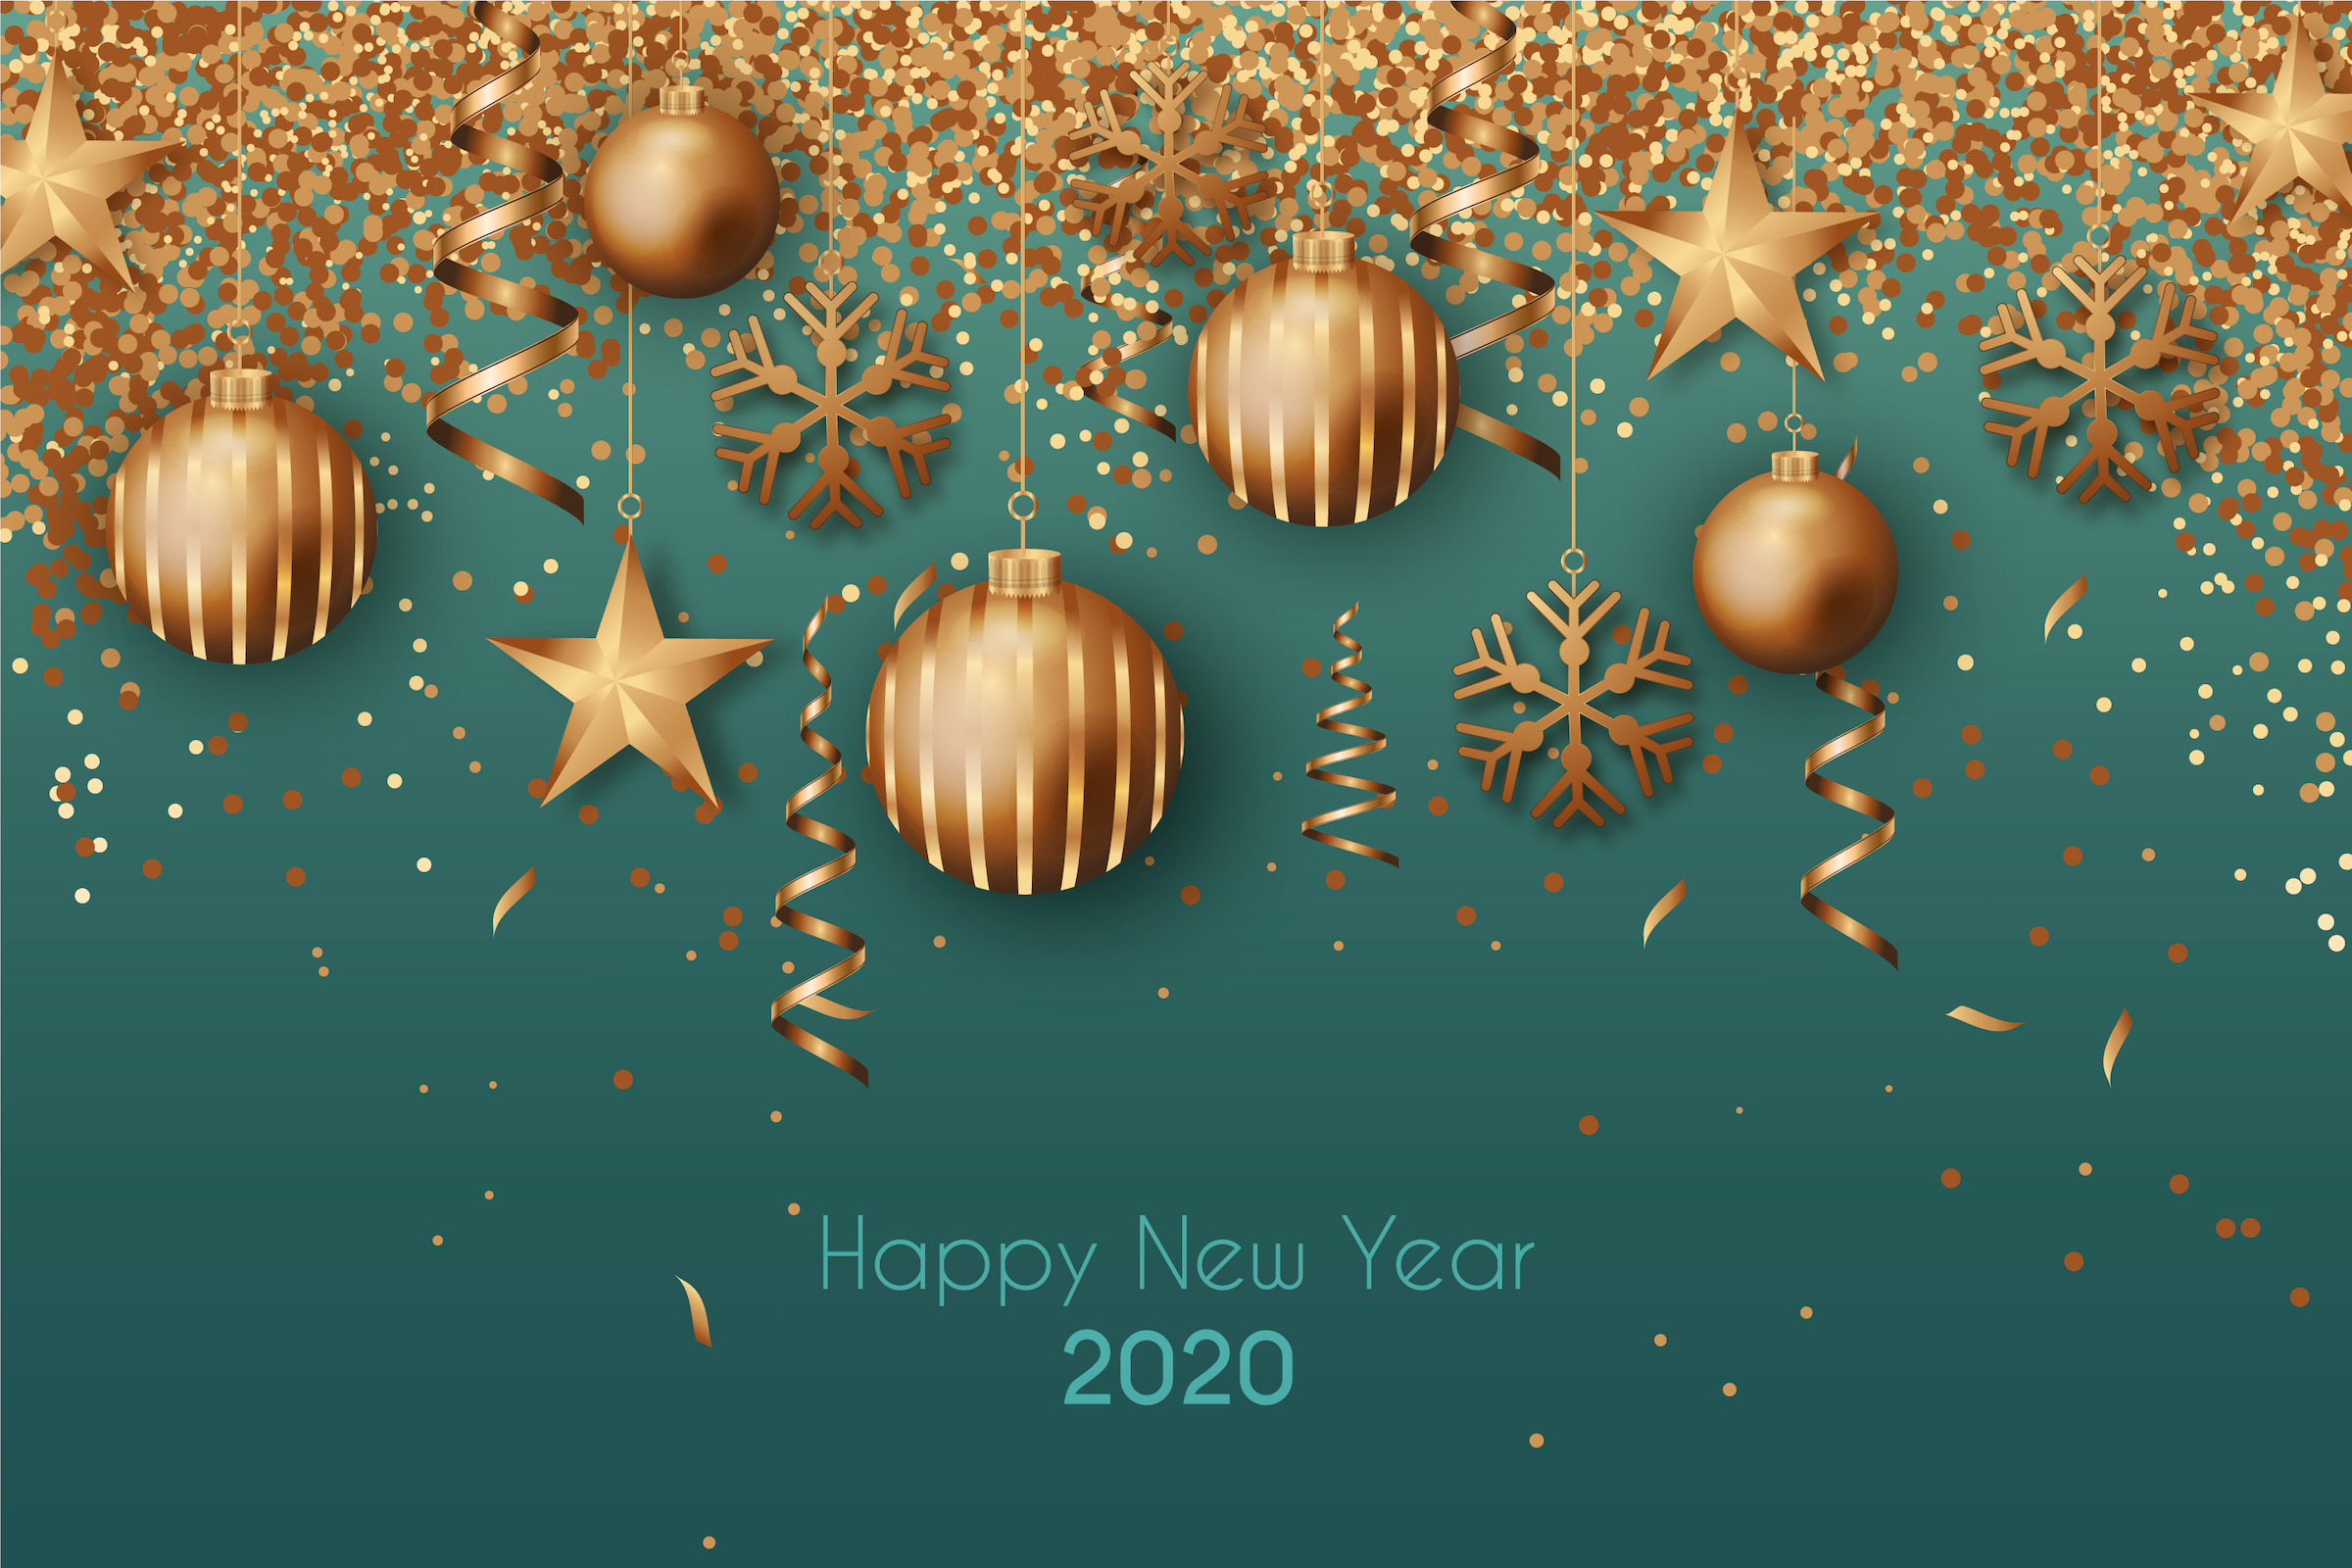 Happy New Year 2020 Green